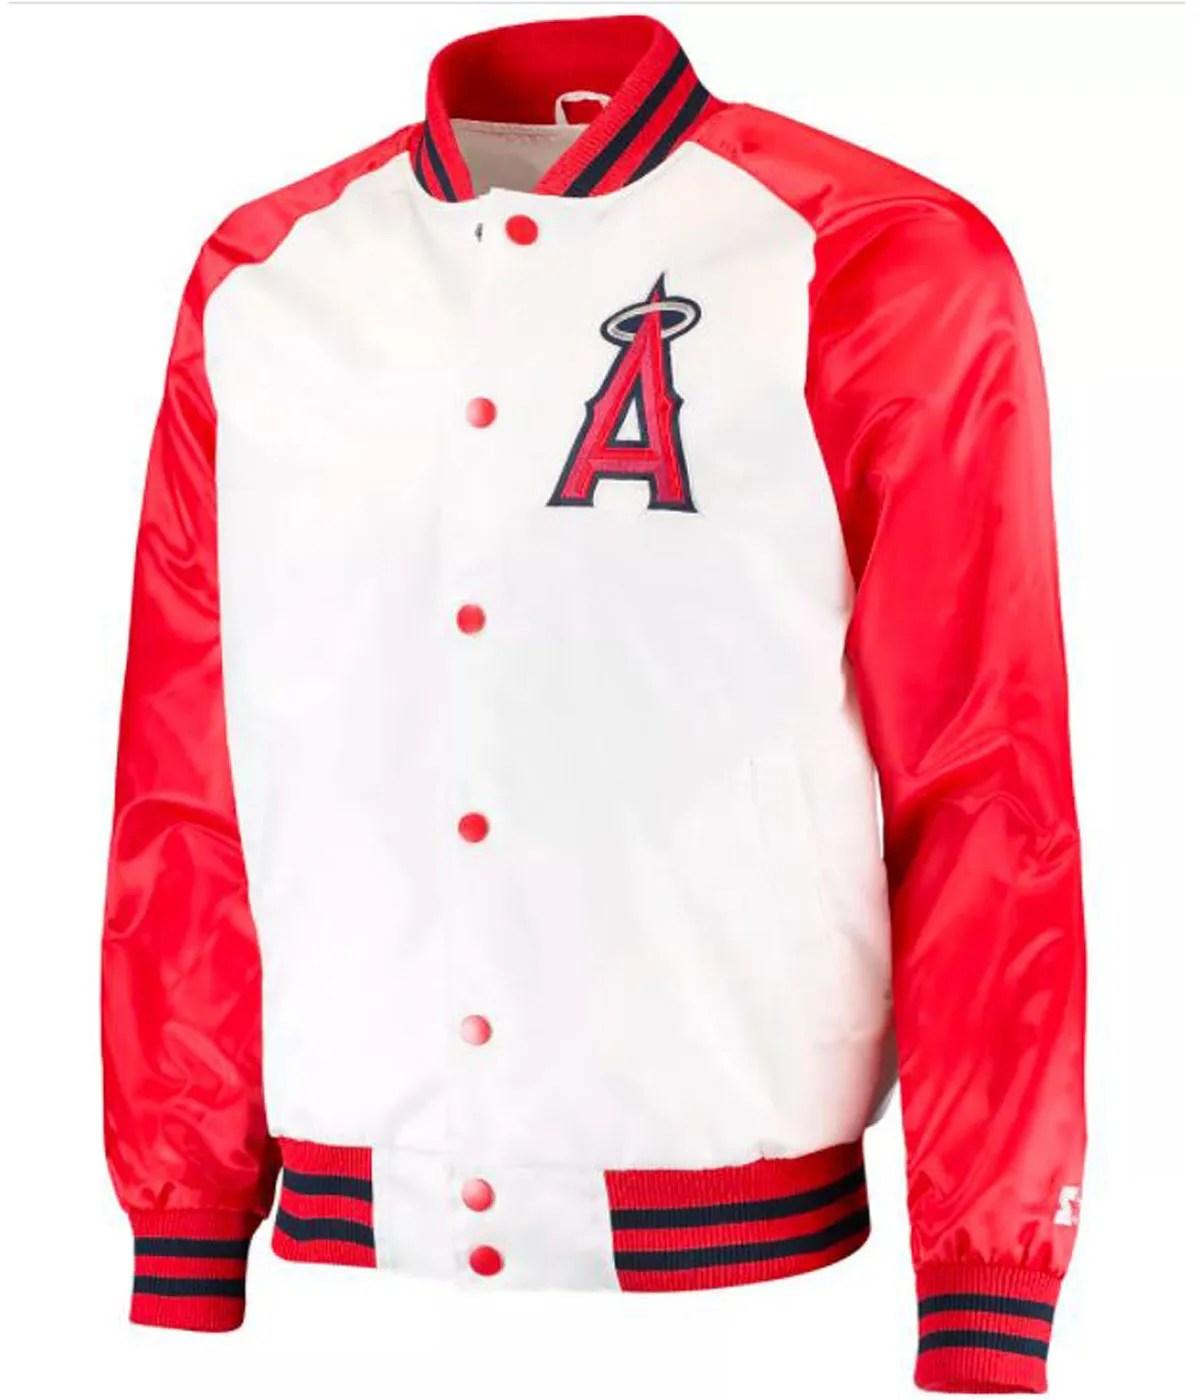 los-angeles-angels-jacket